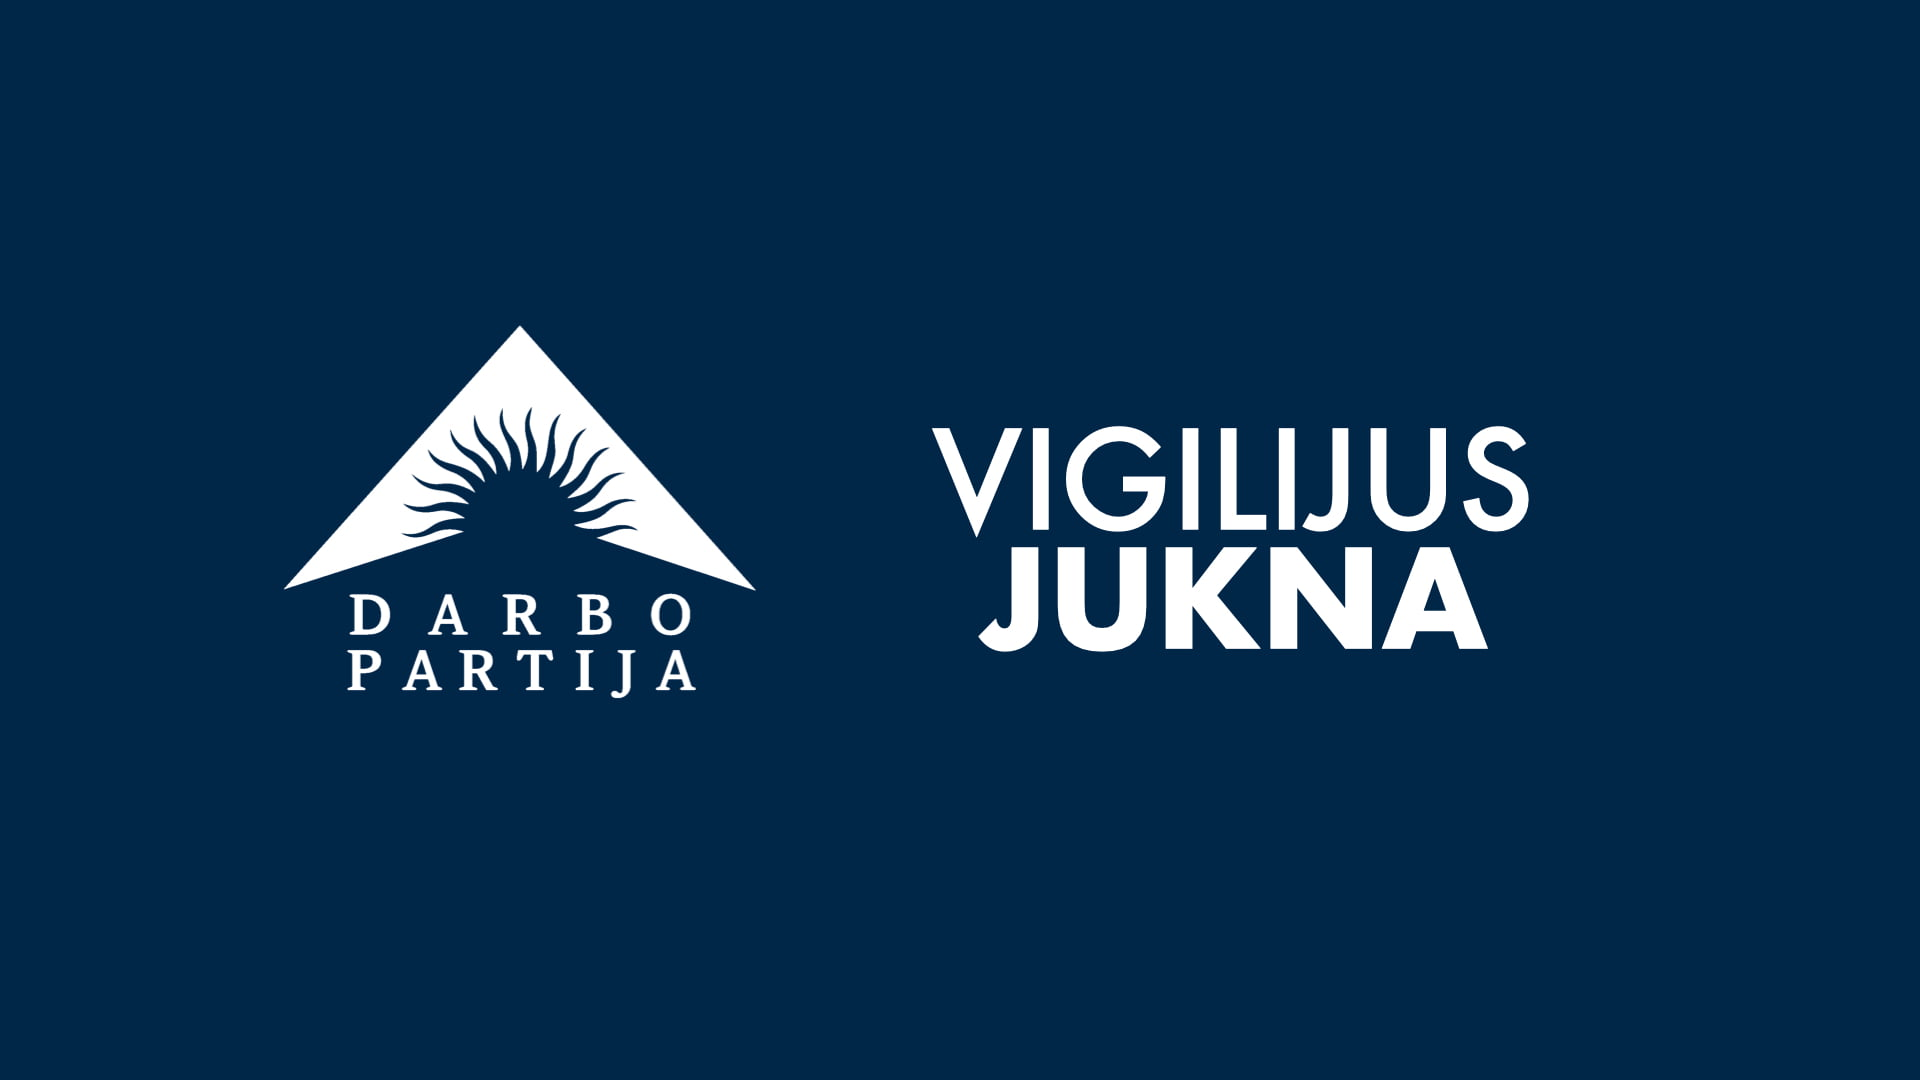 https://www.jukna.lt/wp-content/uploads/2020/06/Vigilijus-Jukna-logo-footer.001.jpg